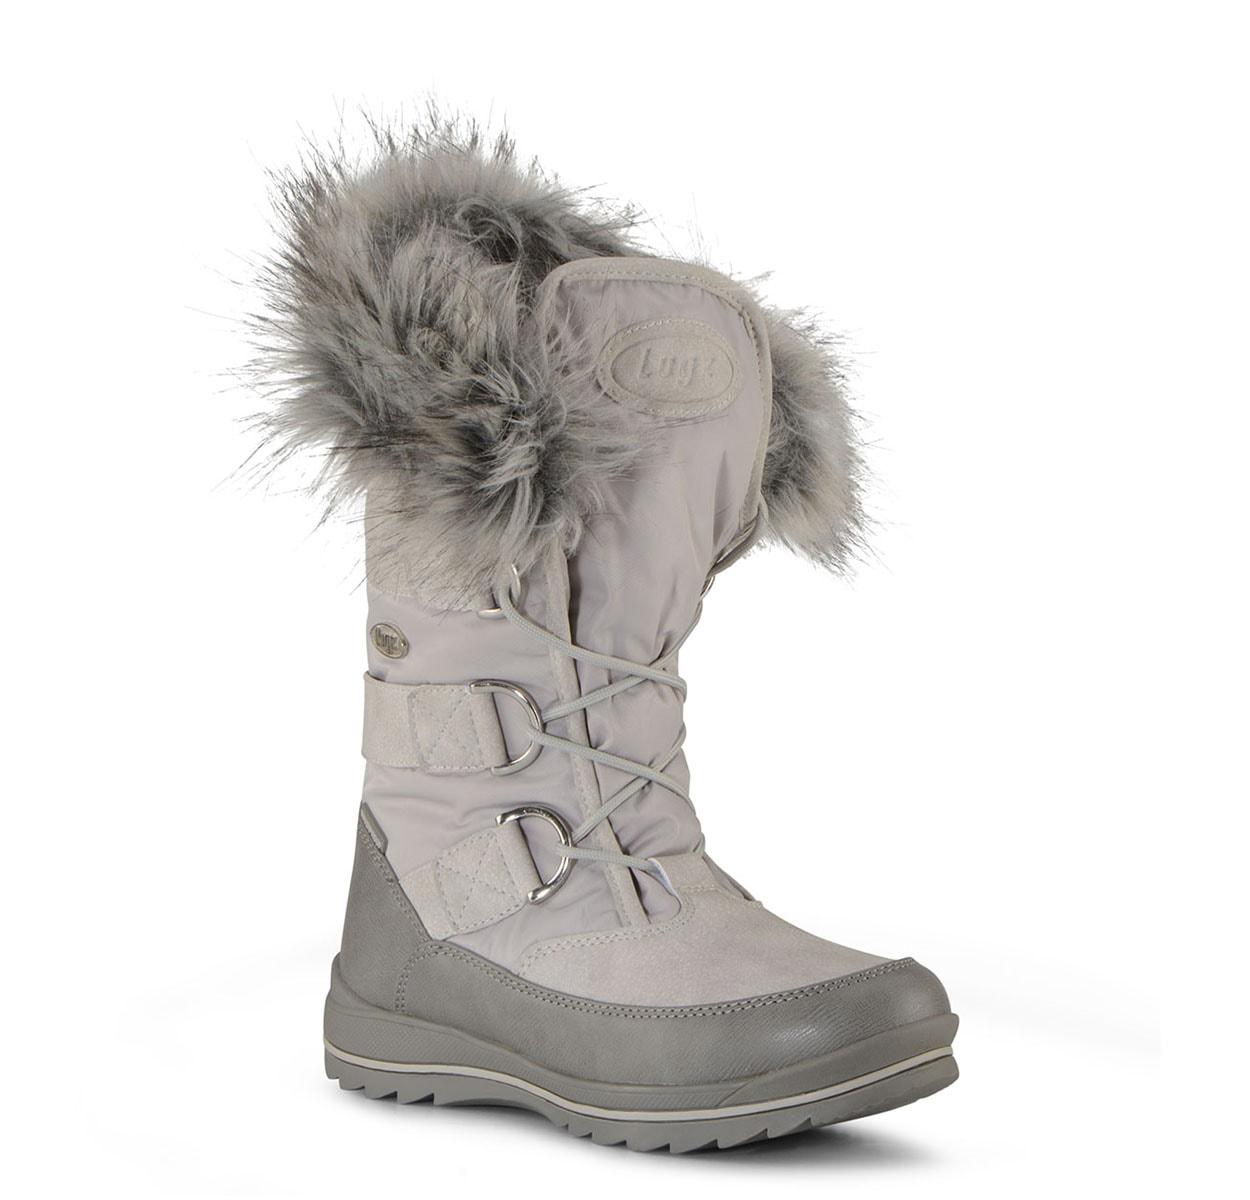 Women's Tundra Fold Down Boot (Choose Your Color: GLACIER/DK GLACIER, Choose Your Size: 8.5)